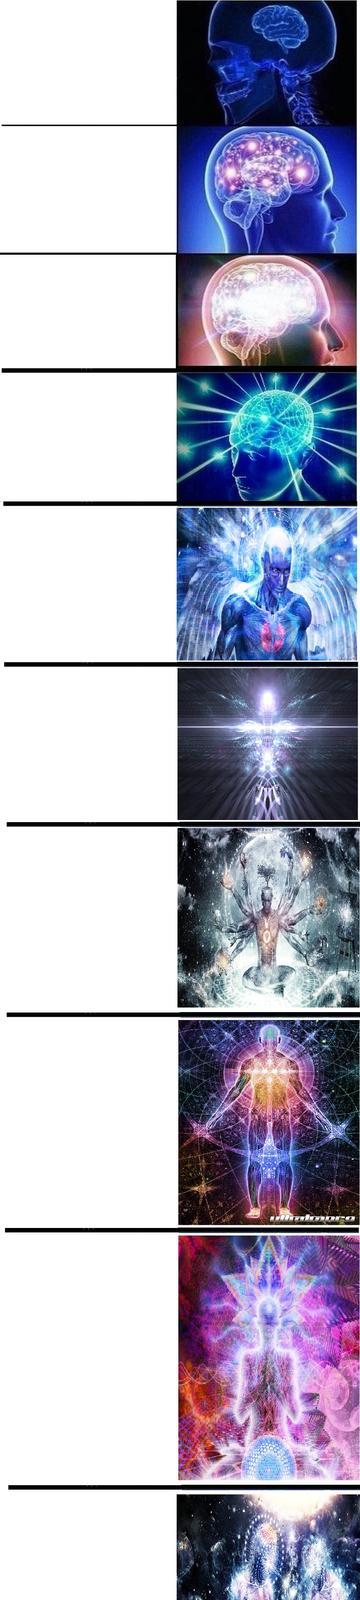 Expanding Brain template   Expanding Brain   Know Your Meme